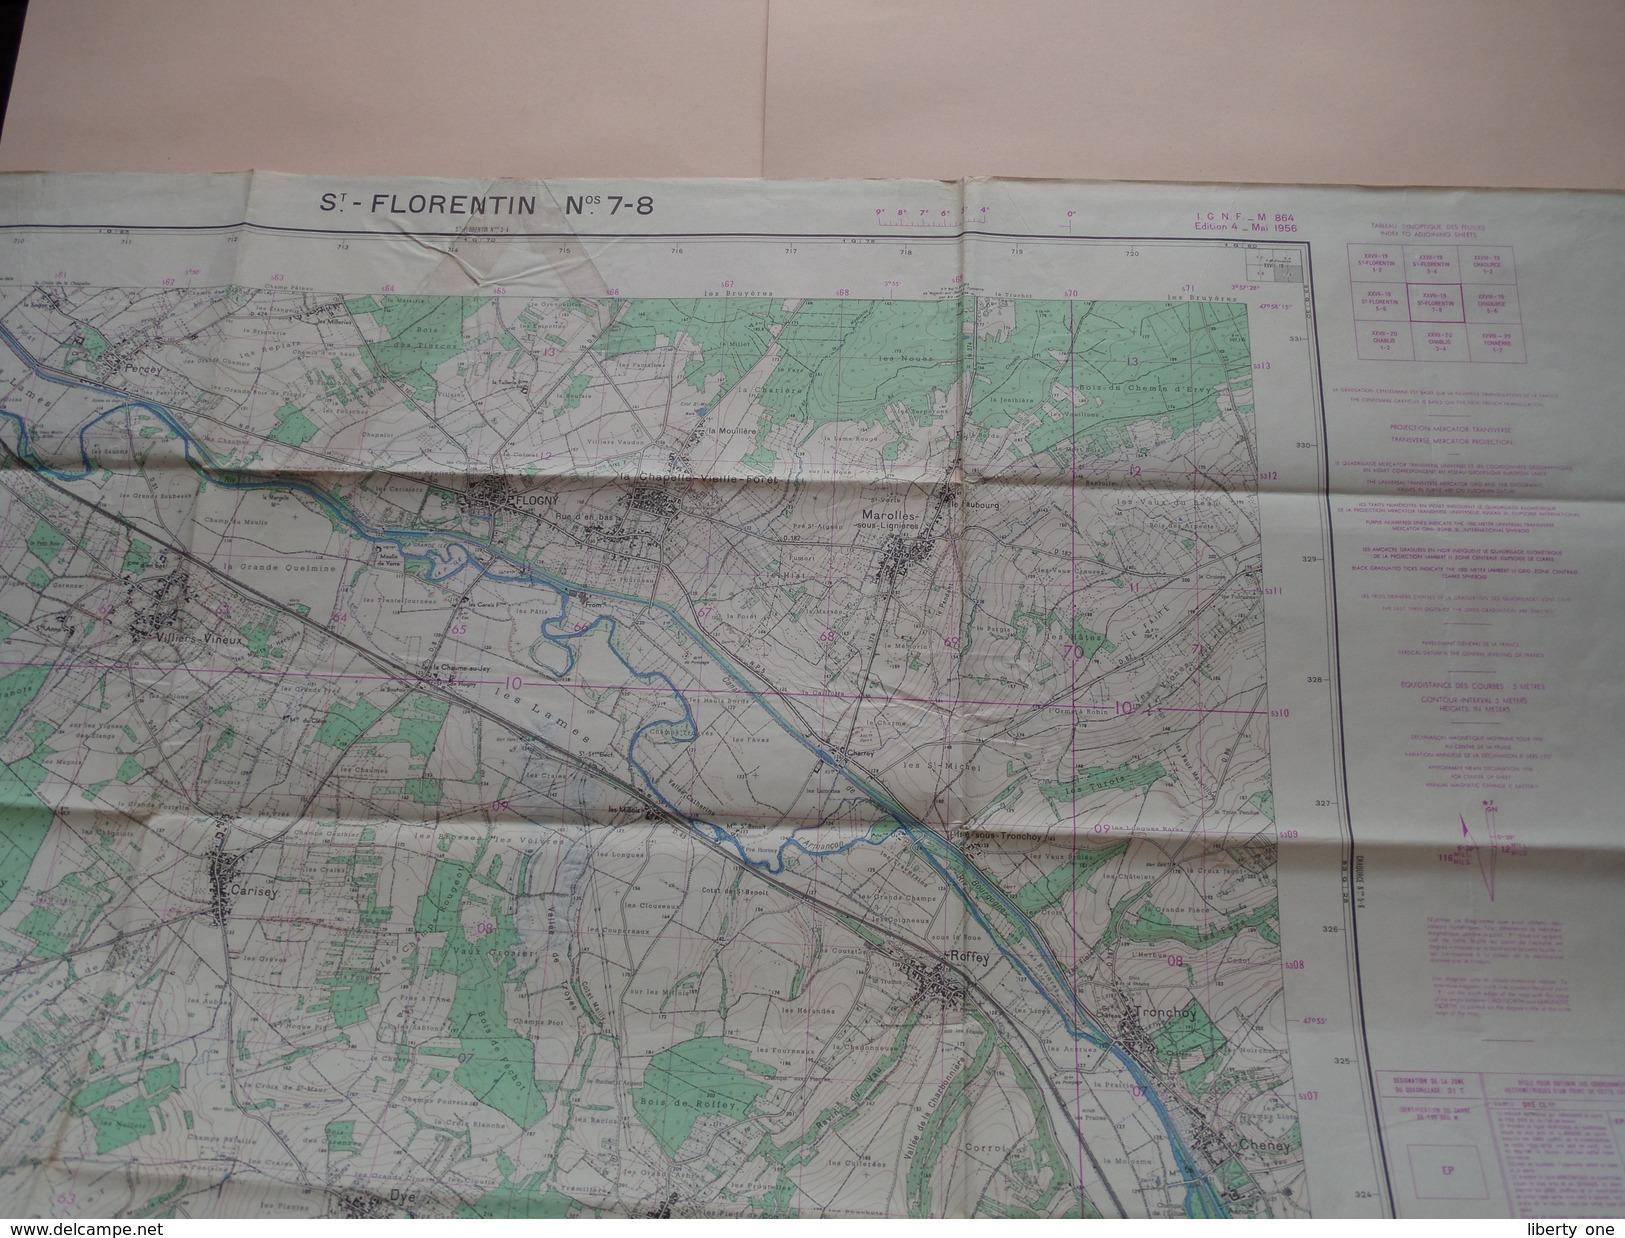 St. - FLORENTIN Nos 7-8 - 1/25.000 I.G.N.F. - M864 Ed.4 Mai 1956 ( Formaat 56 X 72 Cm. ) Zie Foto´s ! - Europe